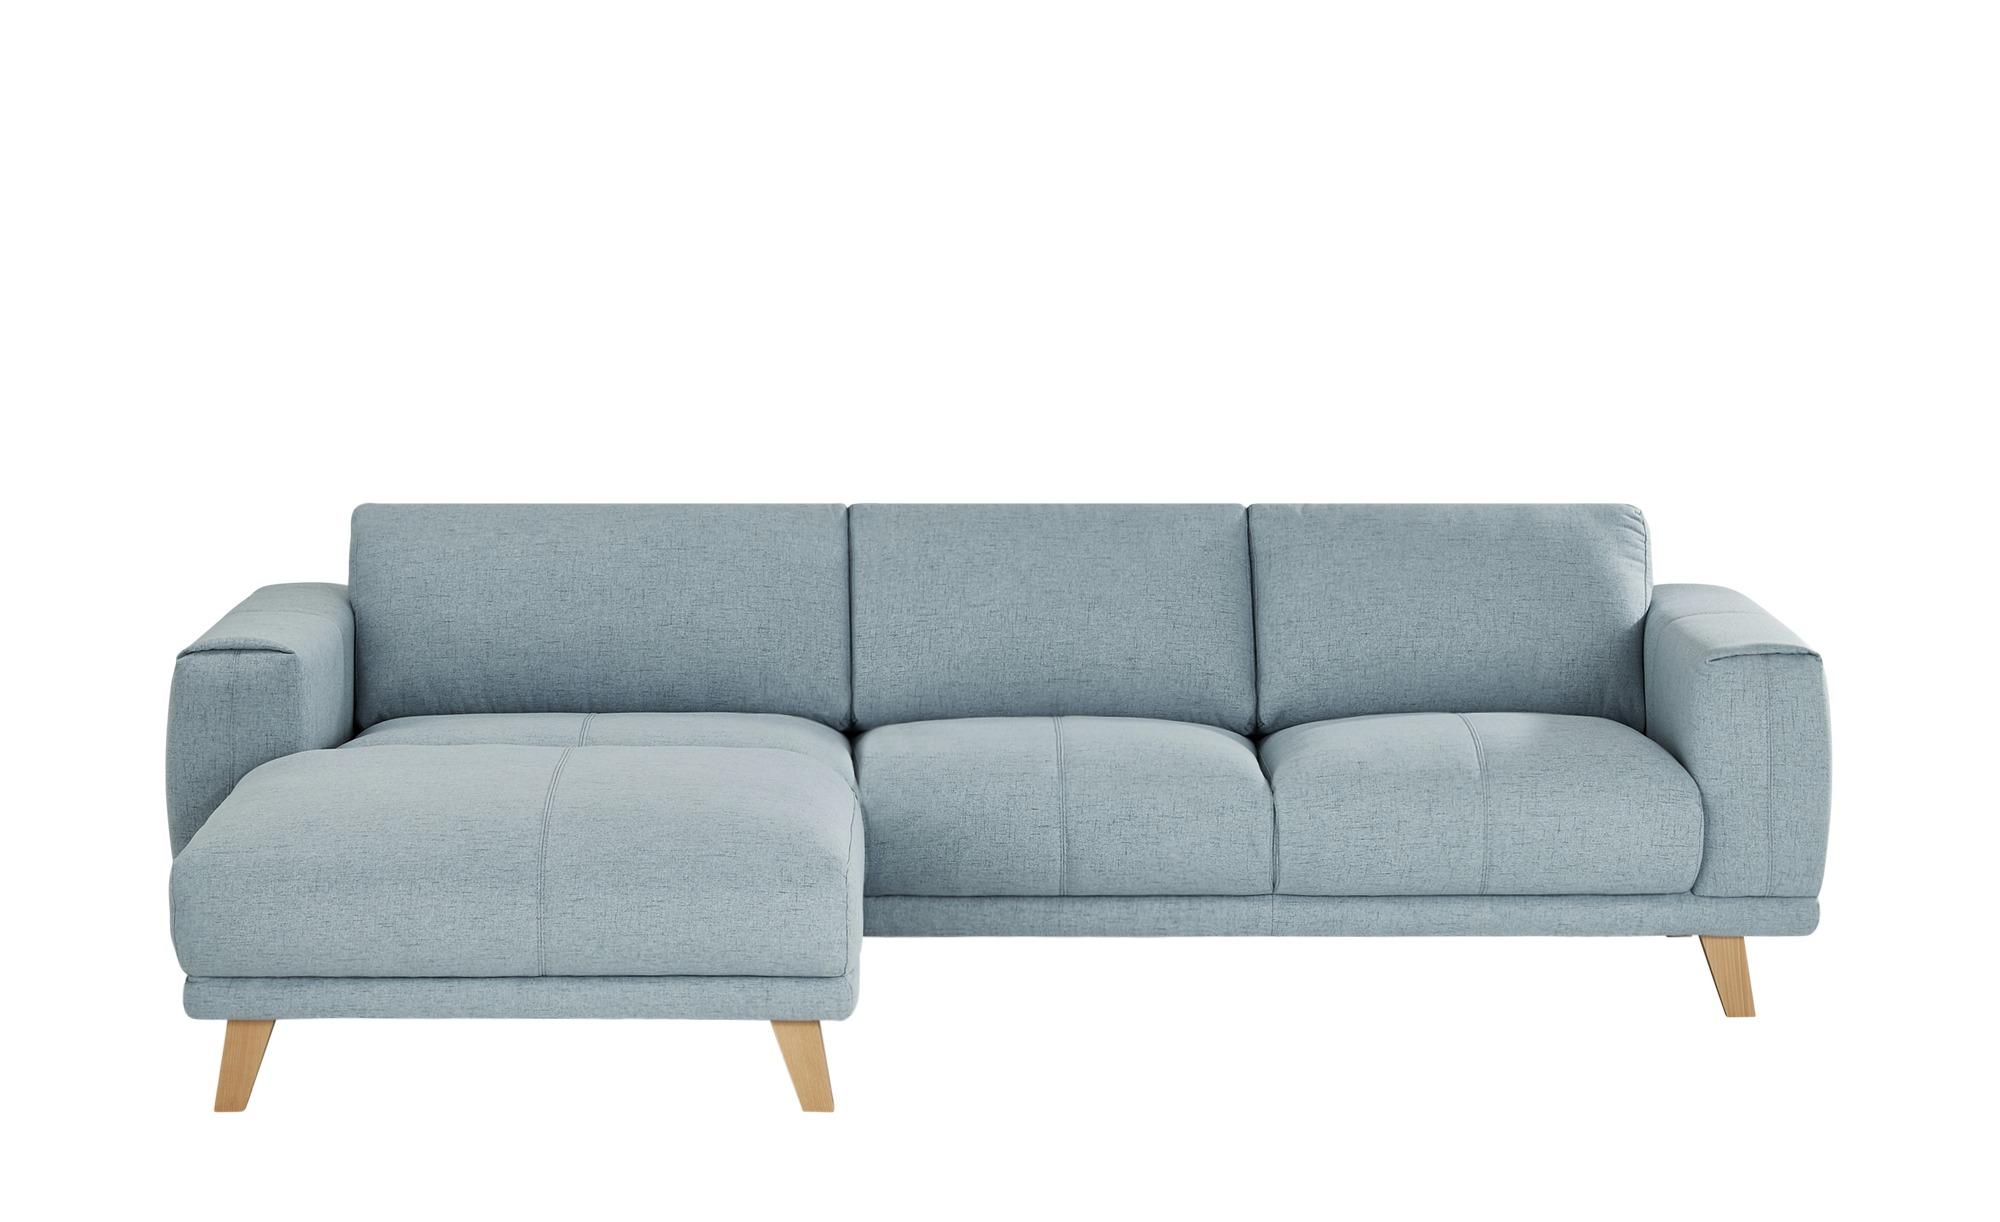 Ecksofa  Serena ¦ blau ¦ Maße (cm): H: 82 Polstermöbel > Sofas > Ecksofas - Höffner